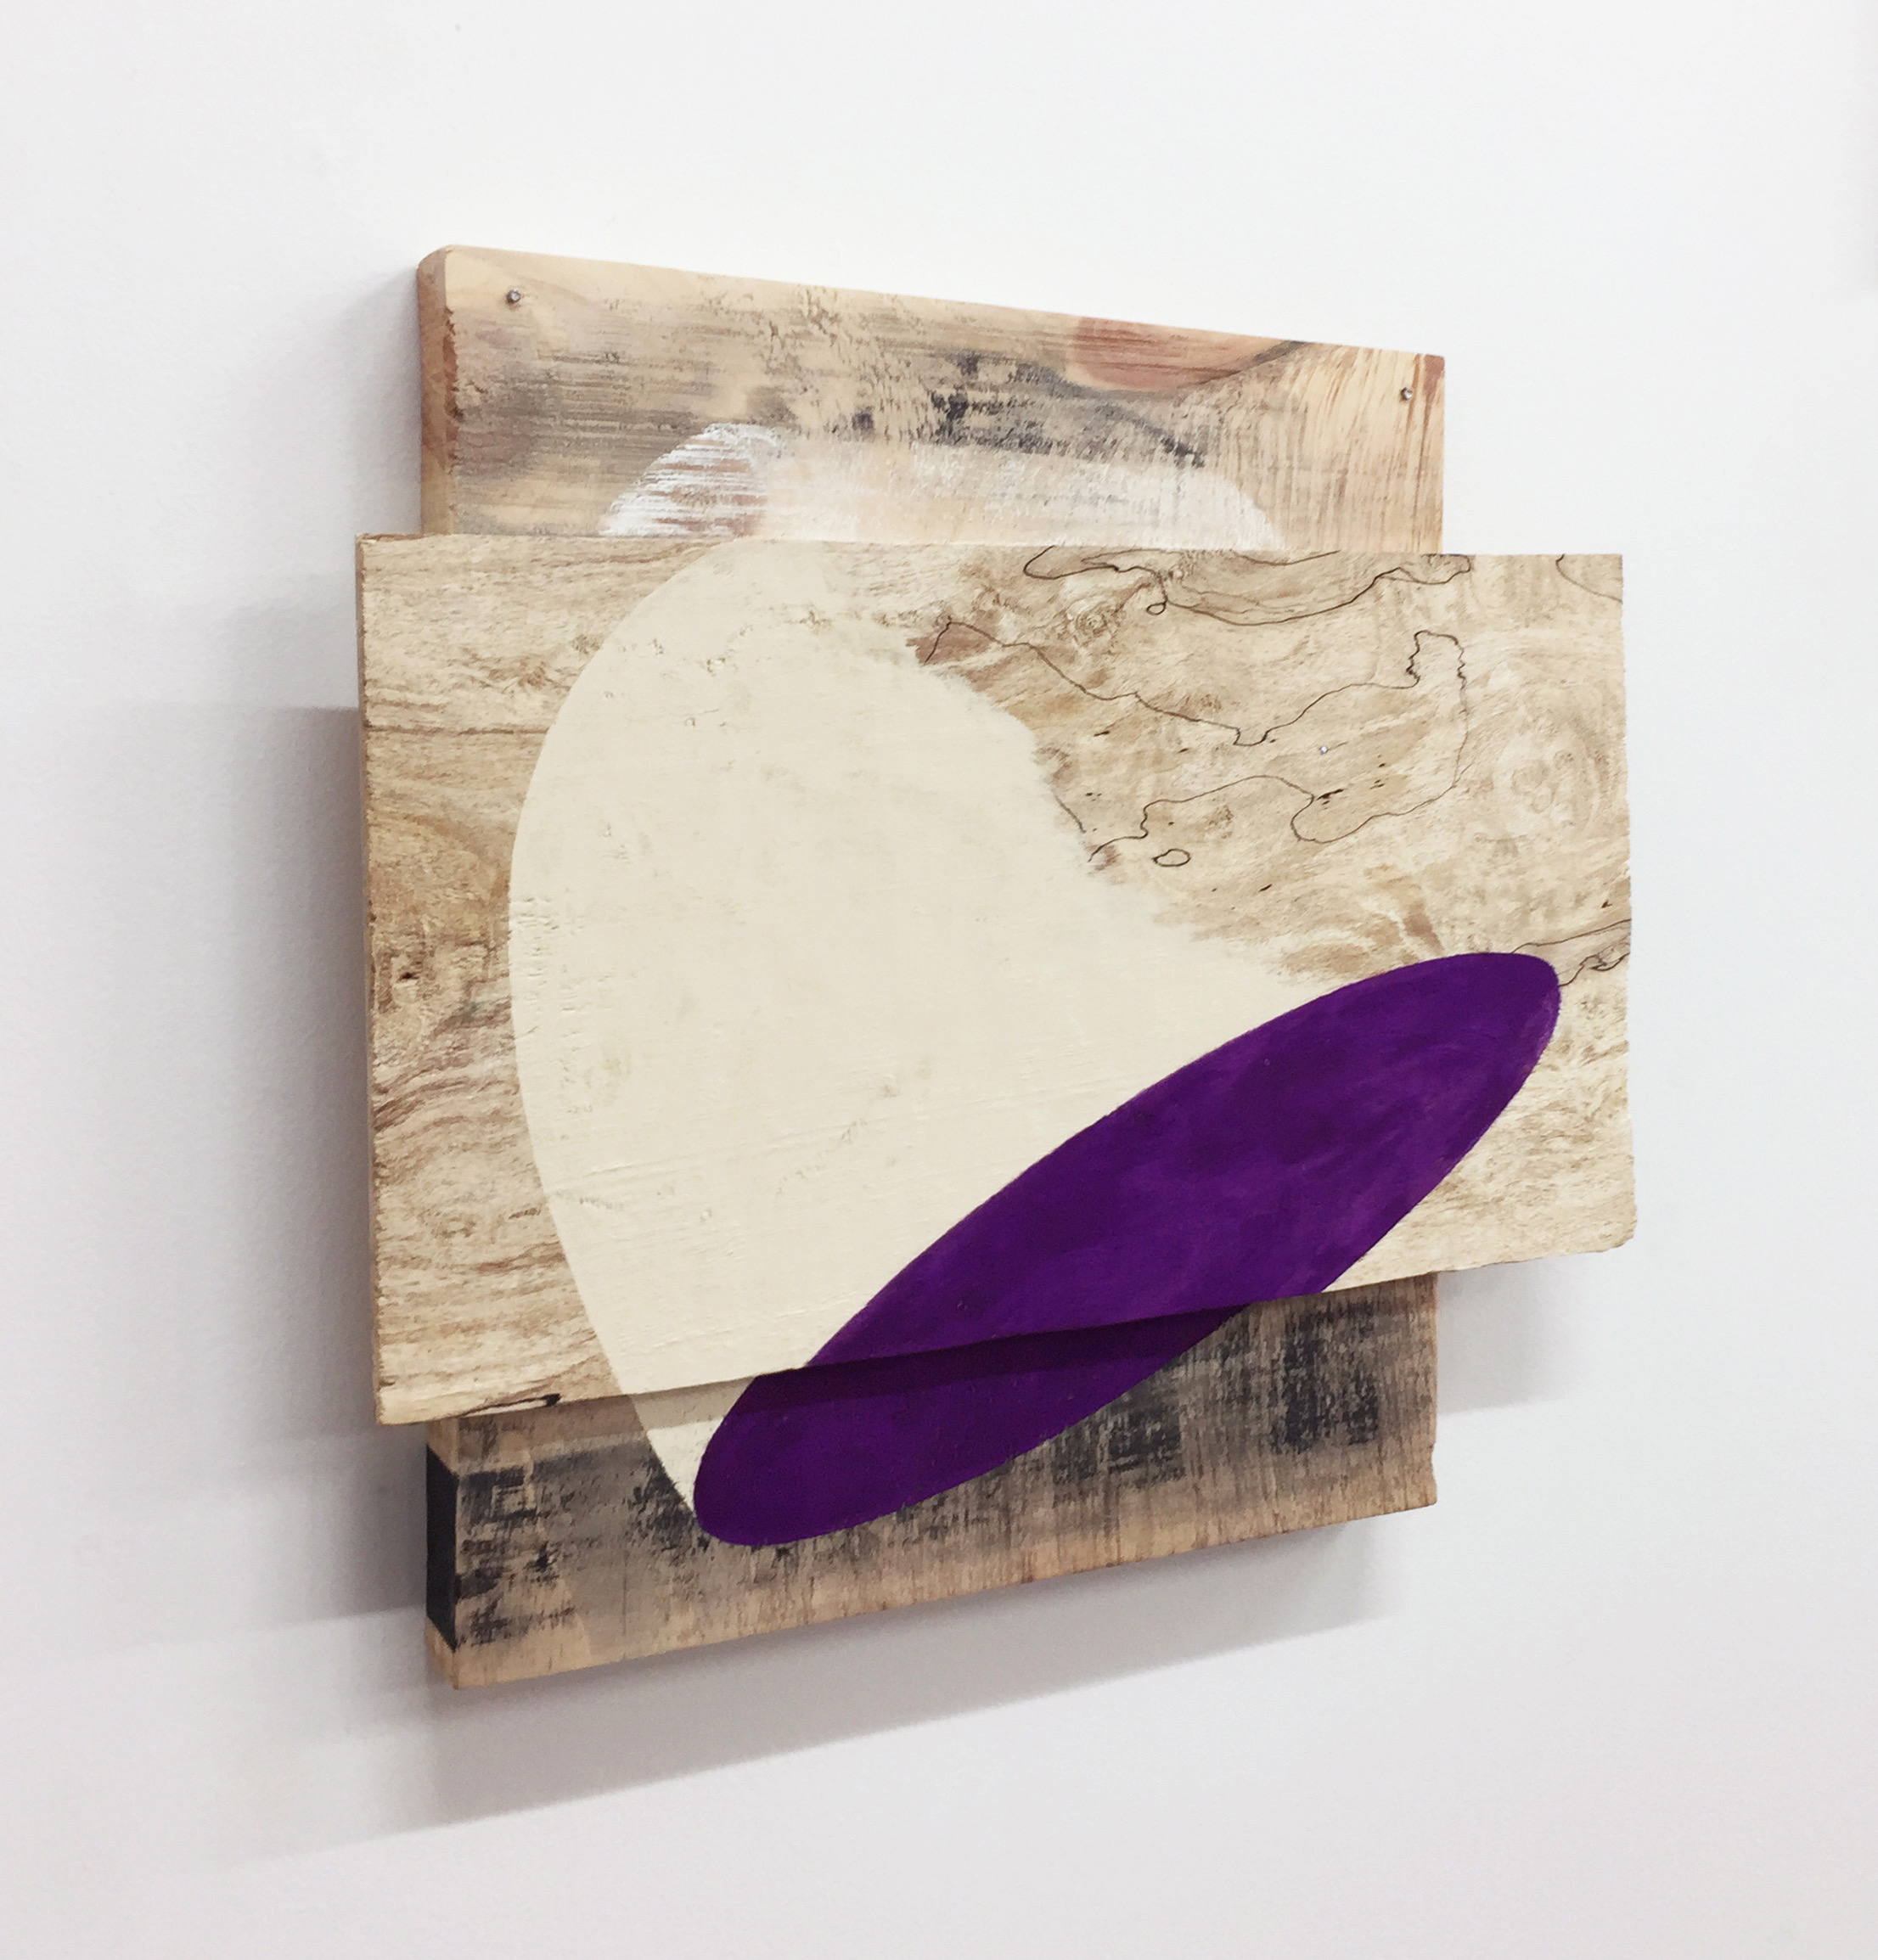 "Untitled, 2018, wood, nails, ink, gouache, flashe, 12 x 13 x 1-1/2"""